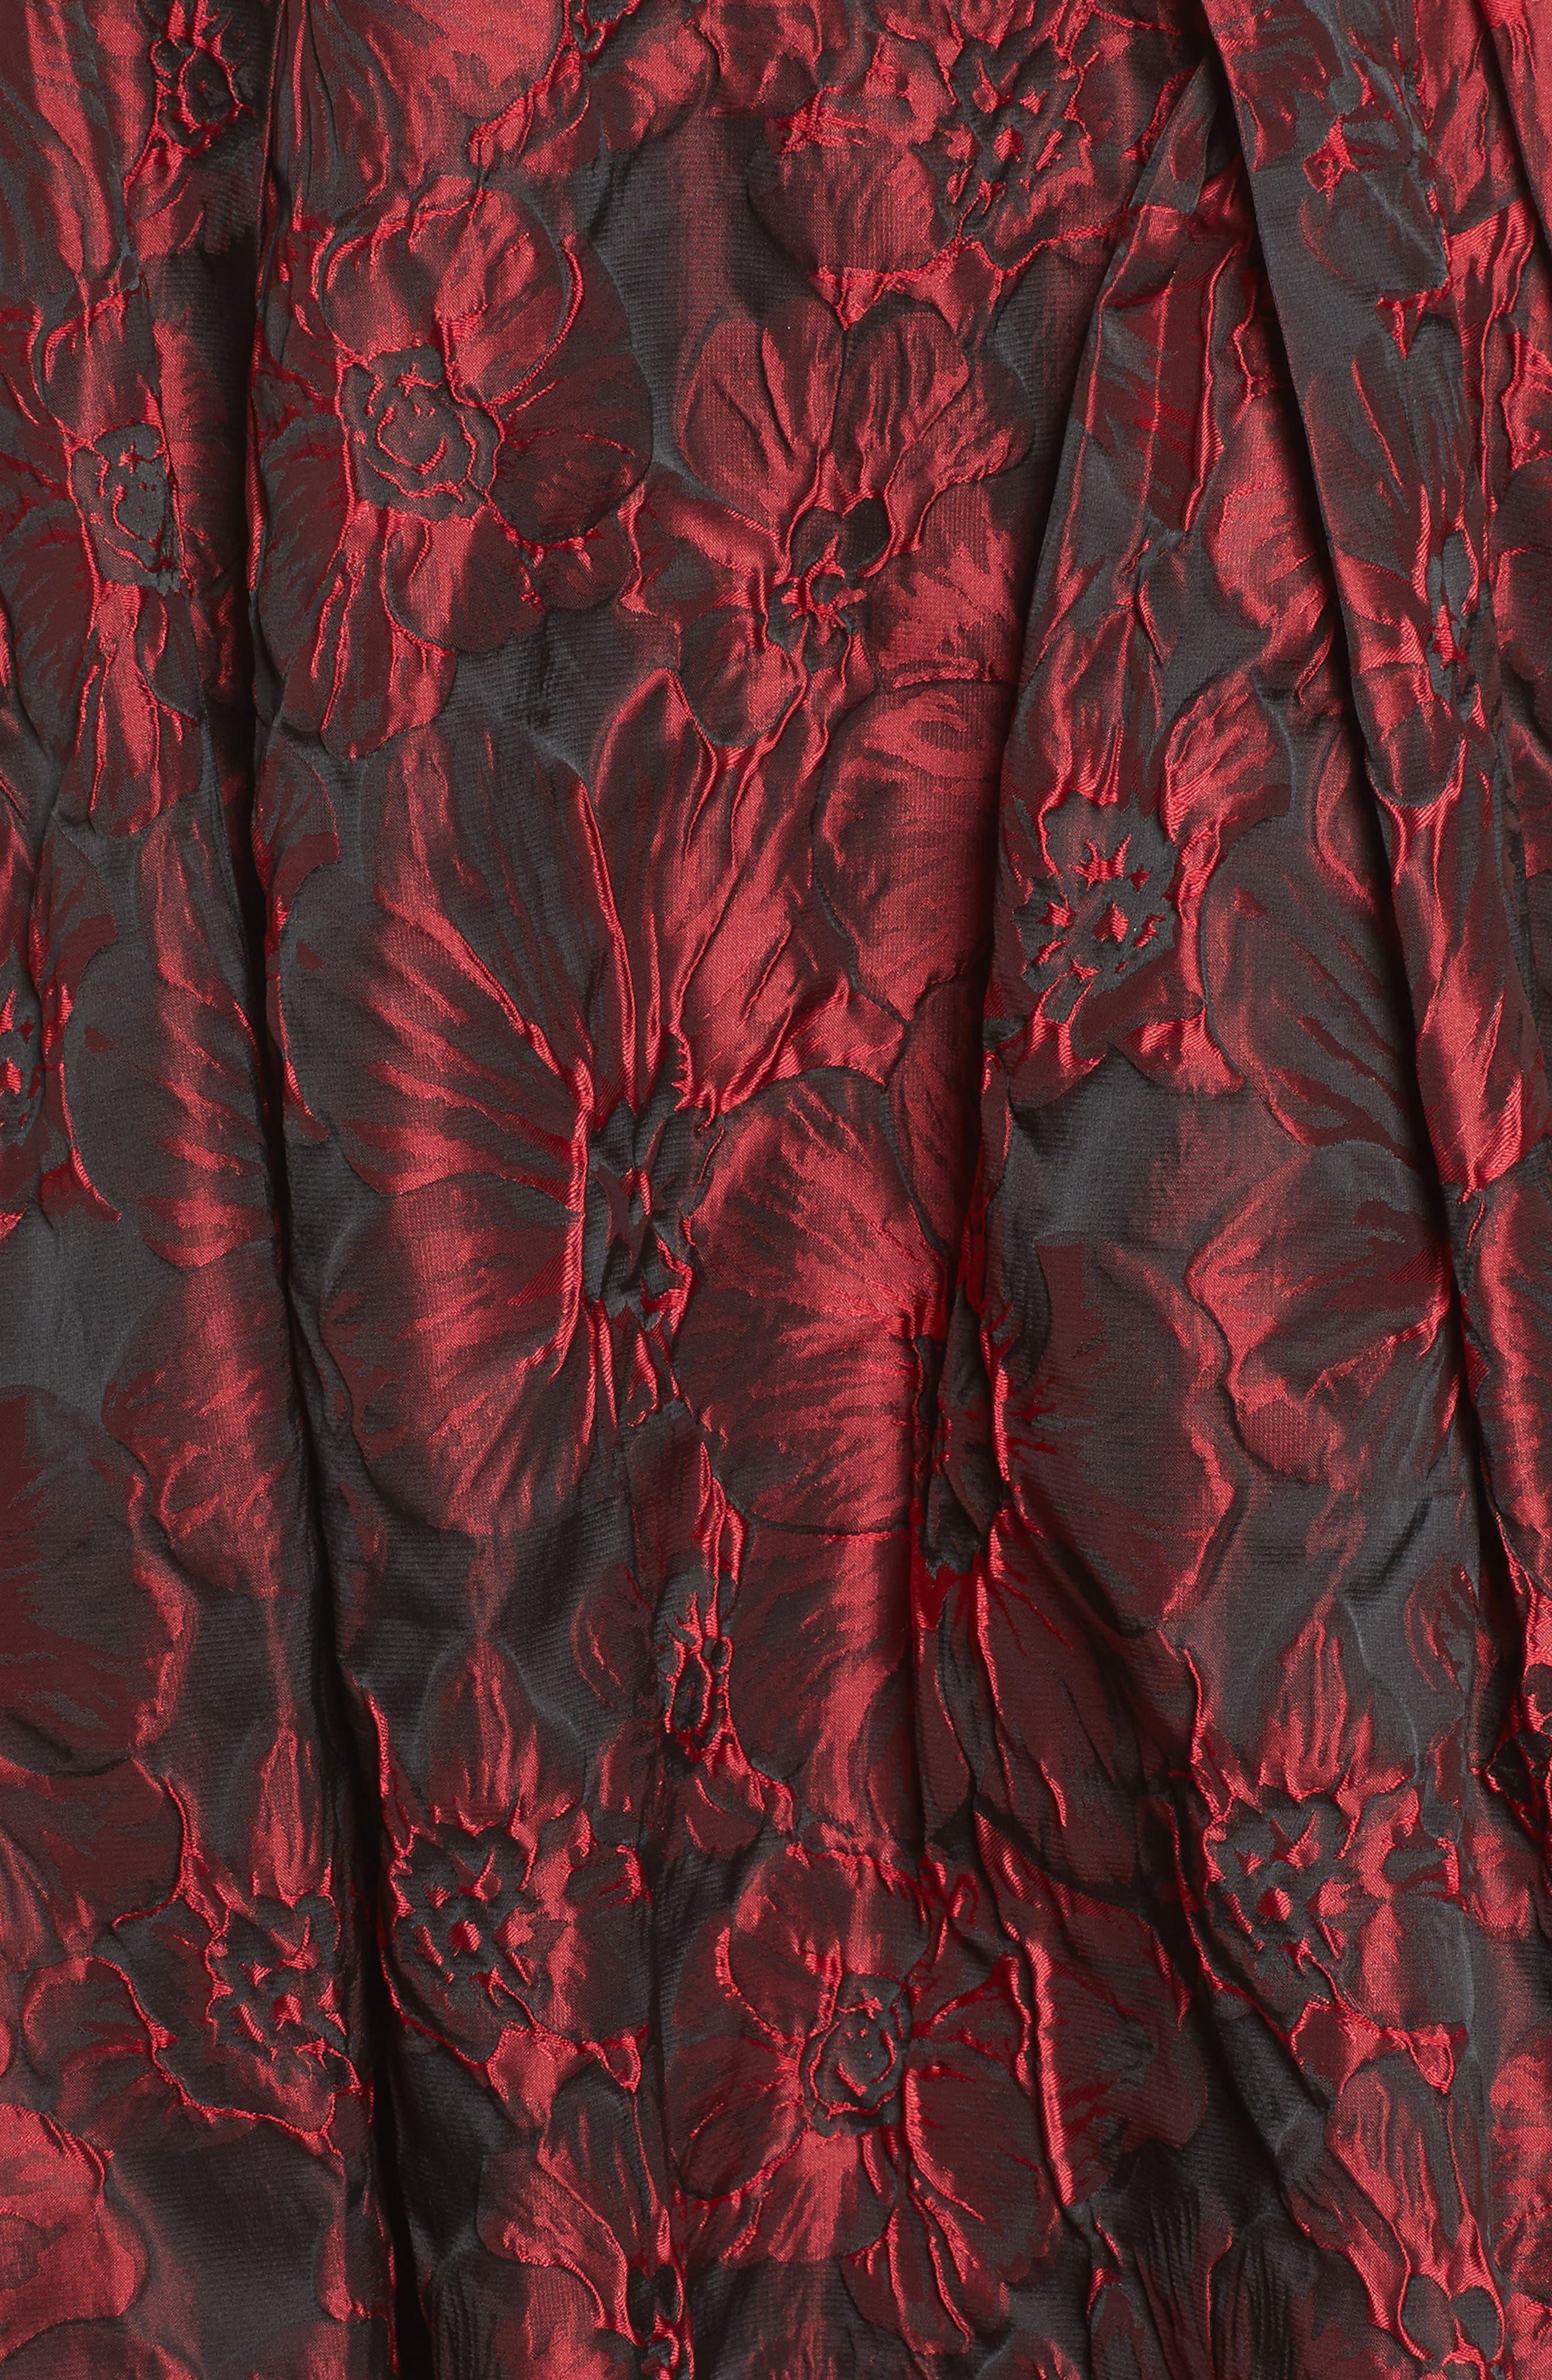 Jacquard High/Low Dress,                             Alternate thumbnail 5, color,                             Red & Black